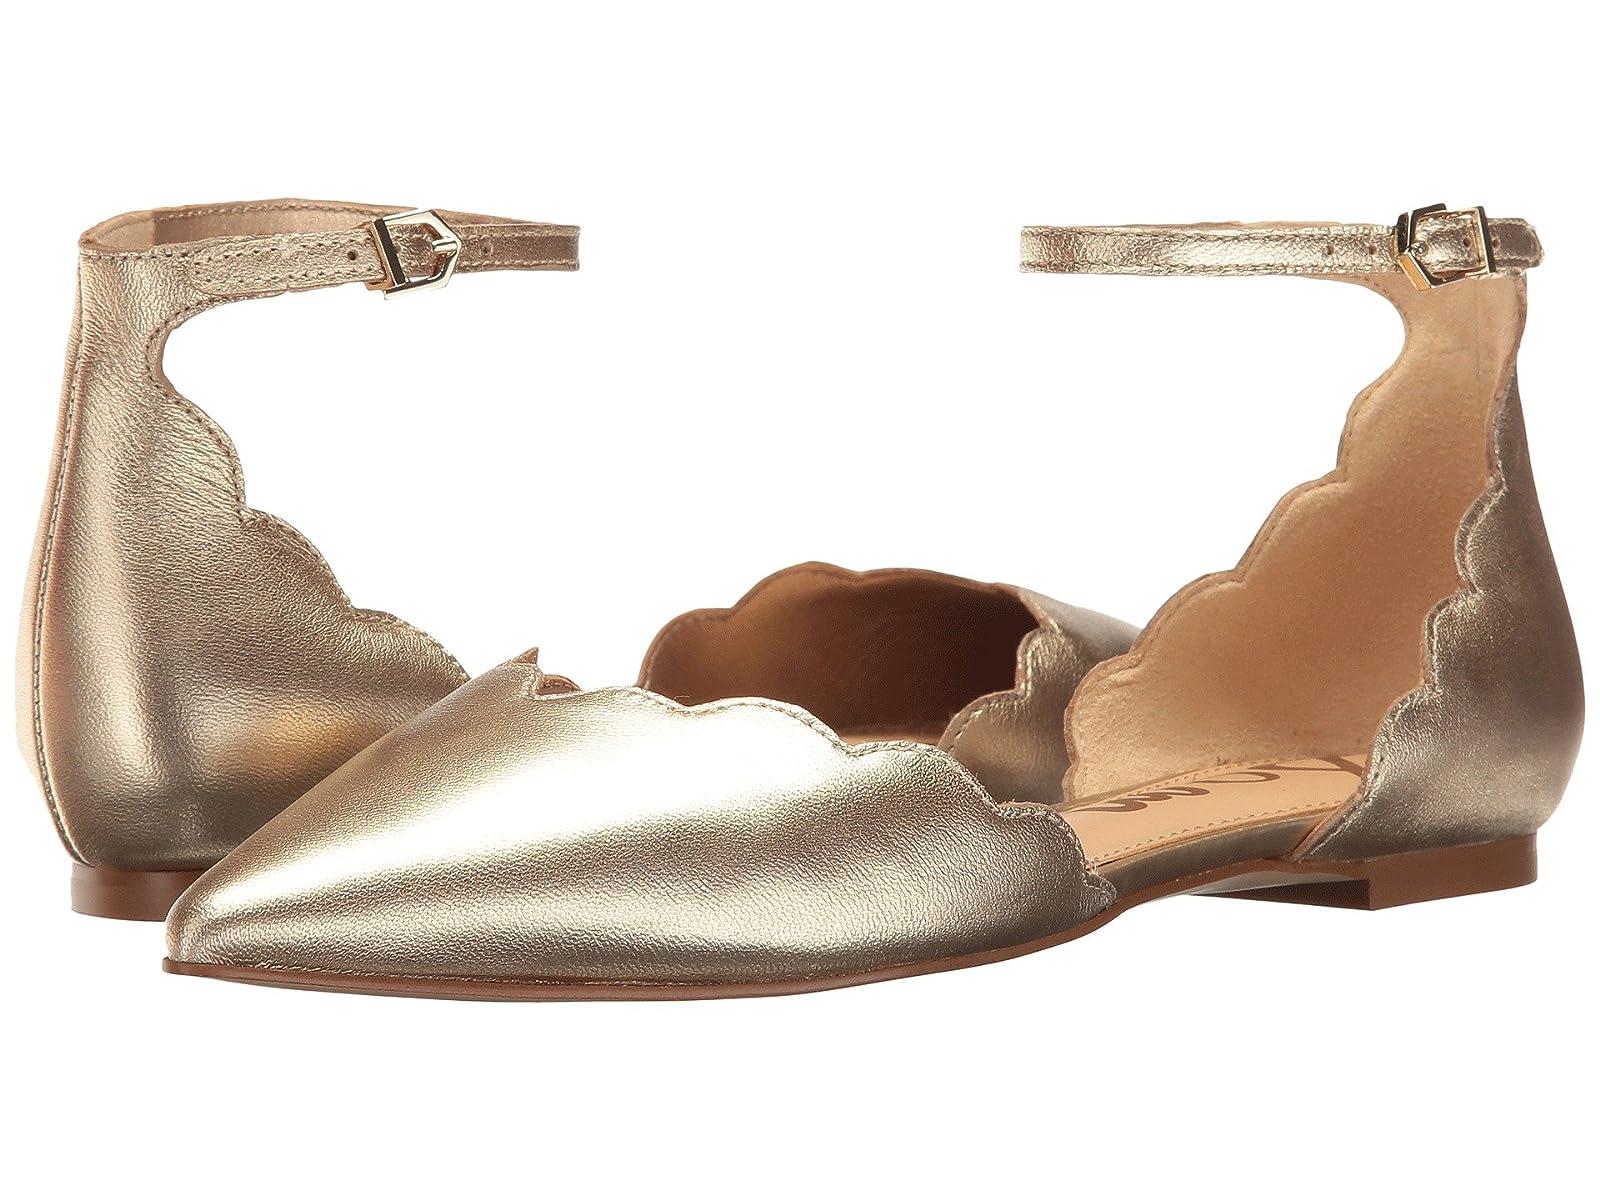 Sam Edelman RowanCheap and distinctive eye-catching shoes